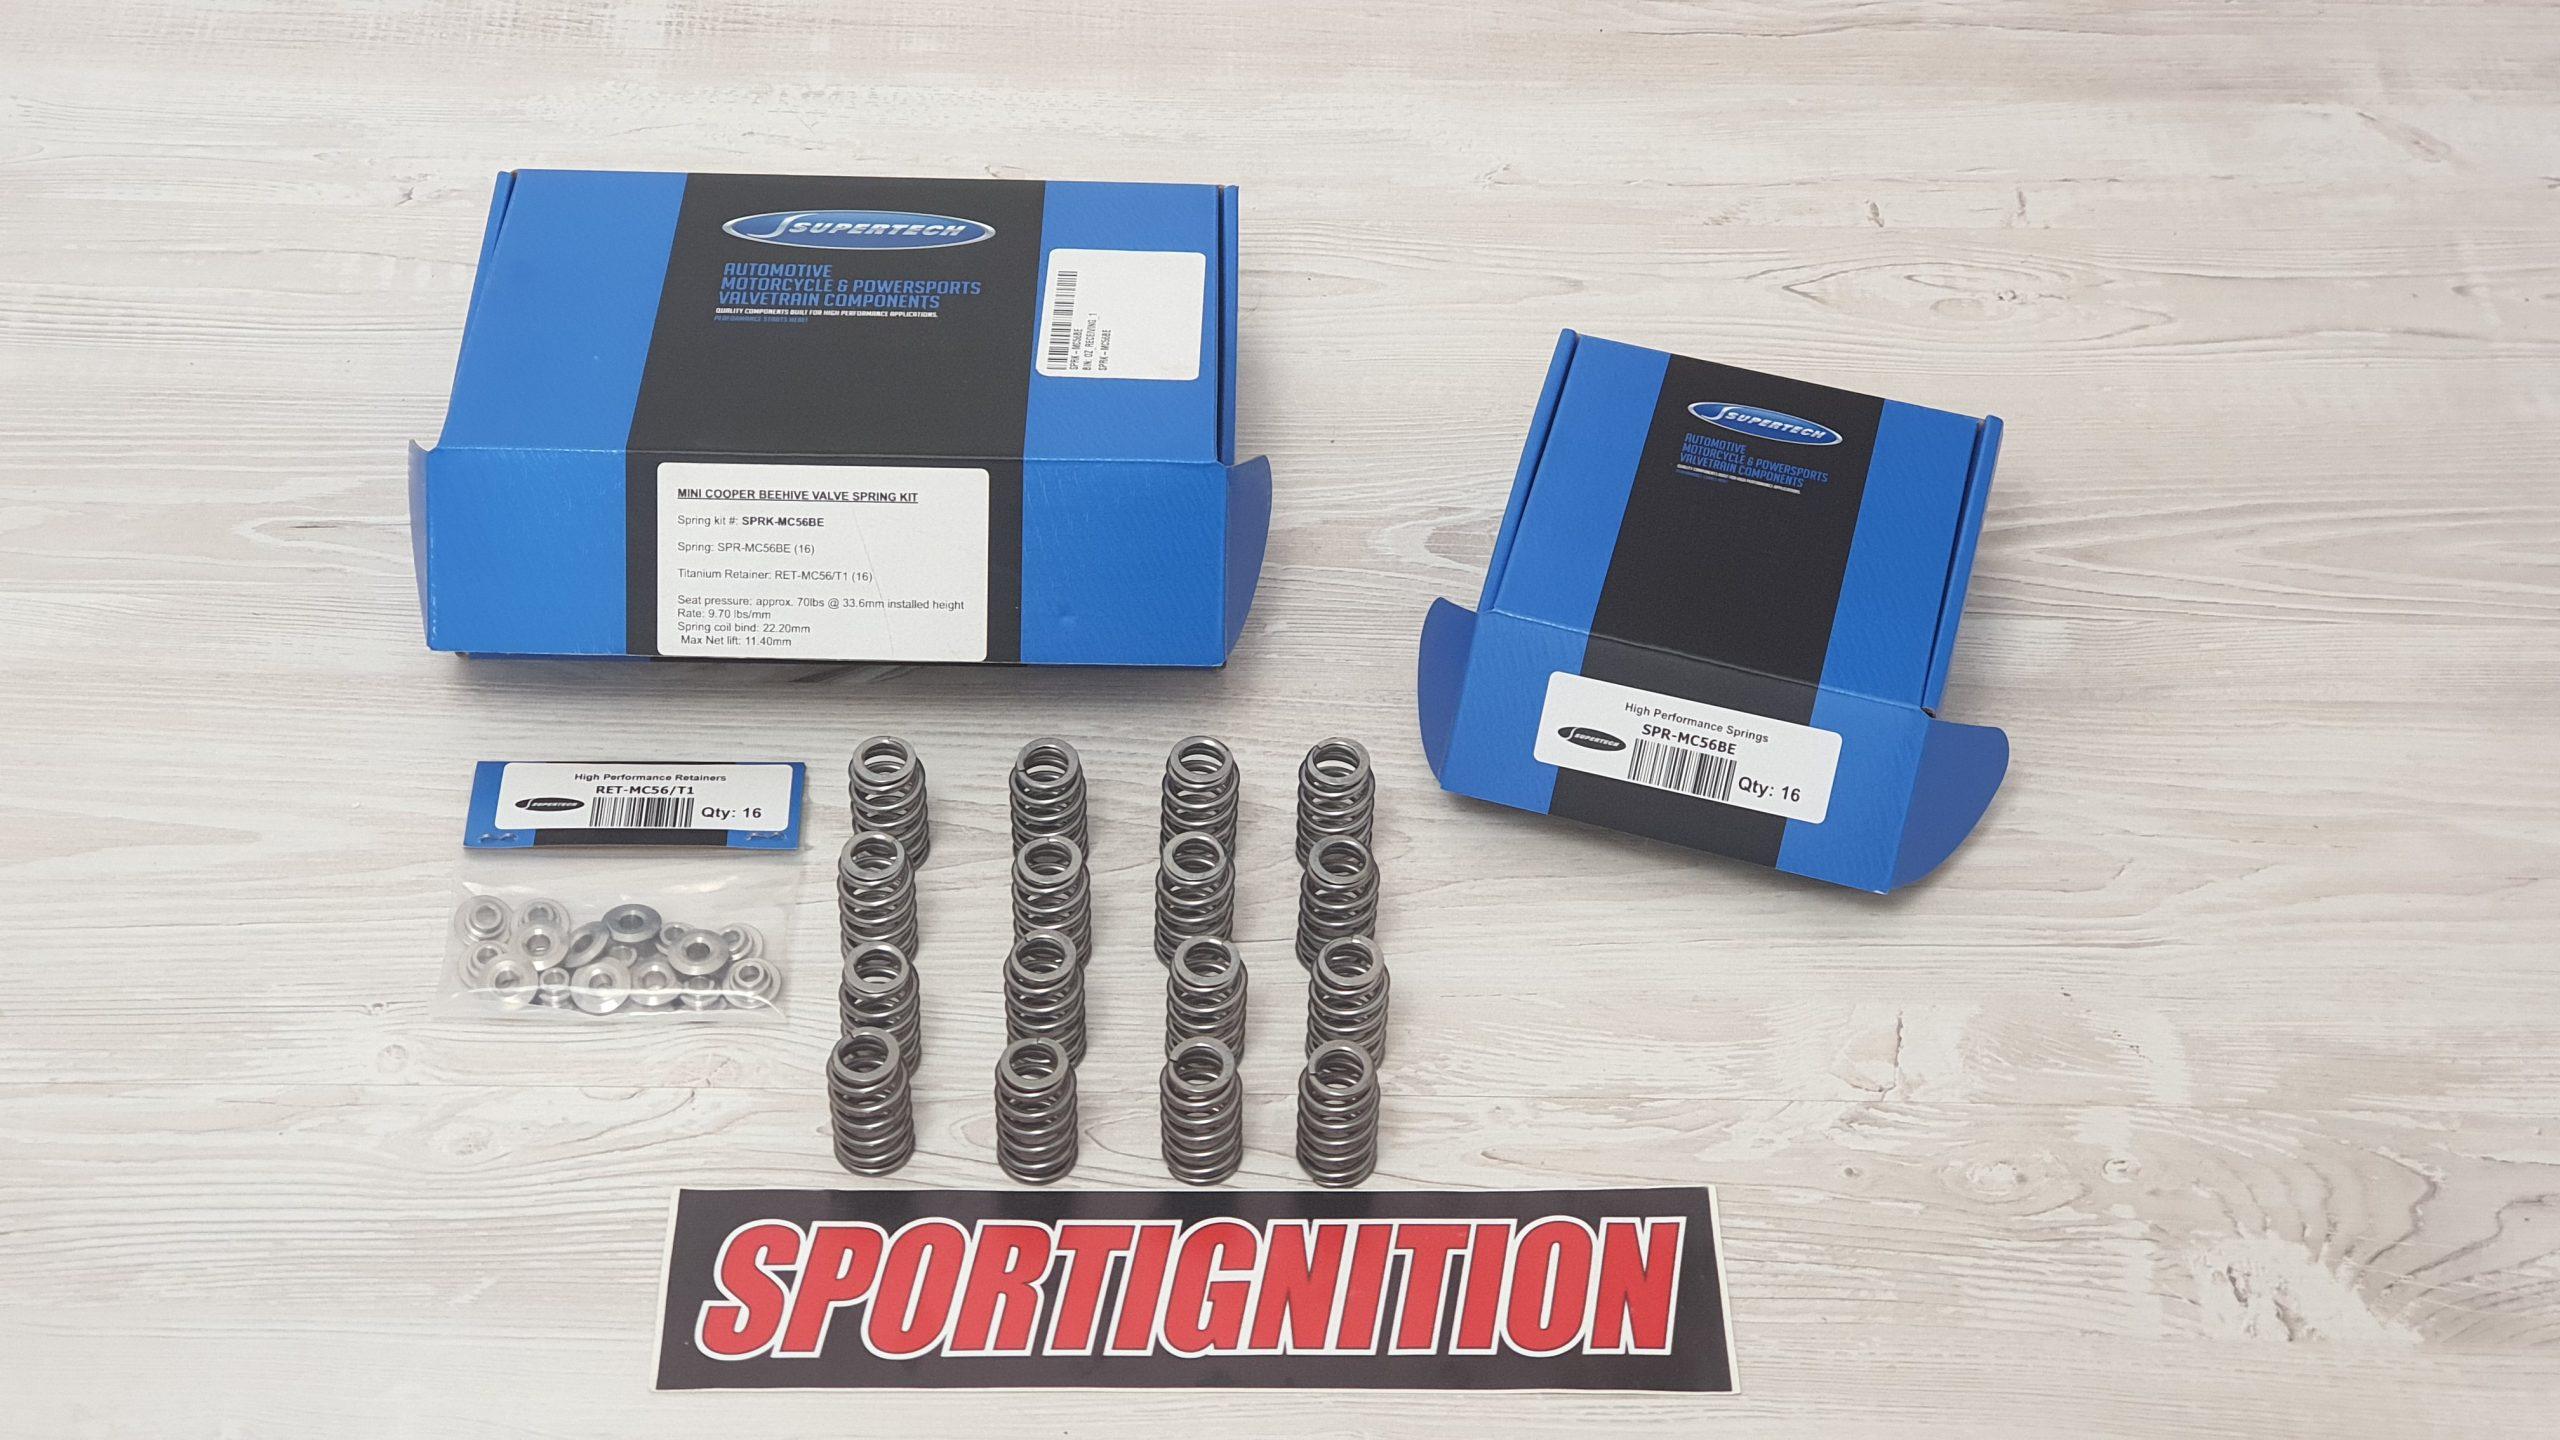 SPRK-MC56BE SPRING KIT MINI N14 N18 OPEL OPC Z16LER SPORTIGNITION